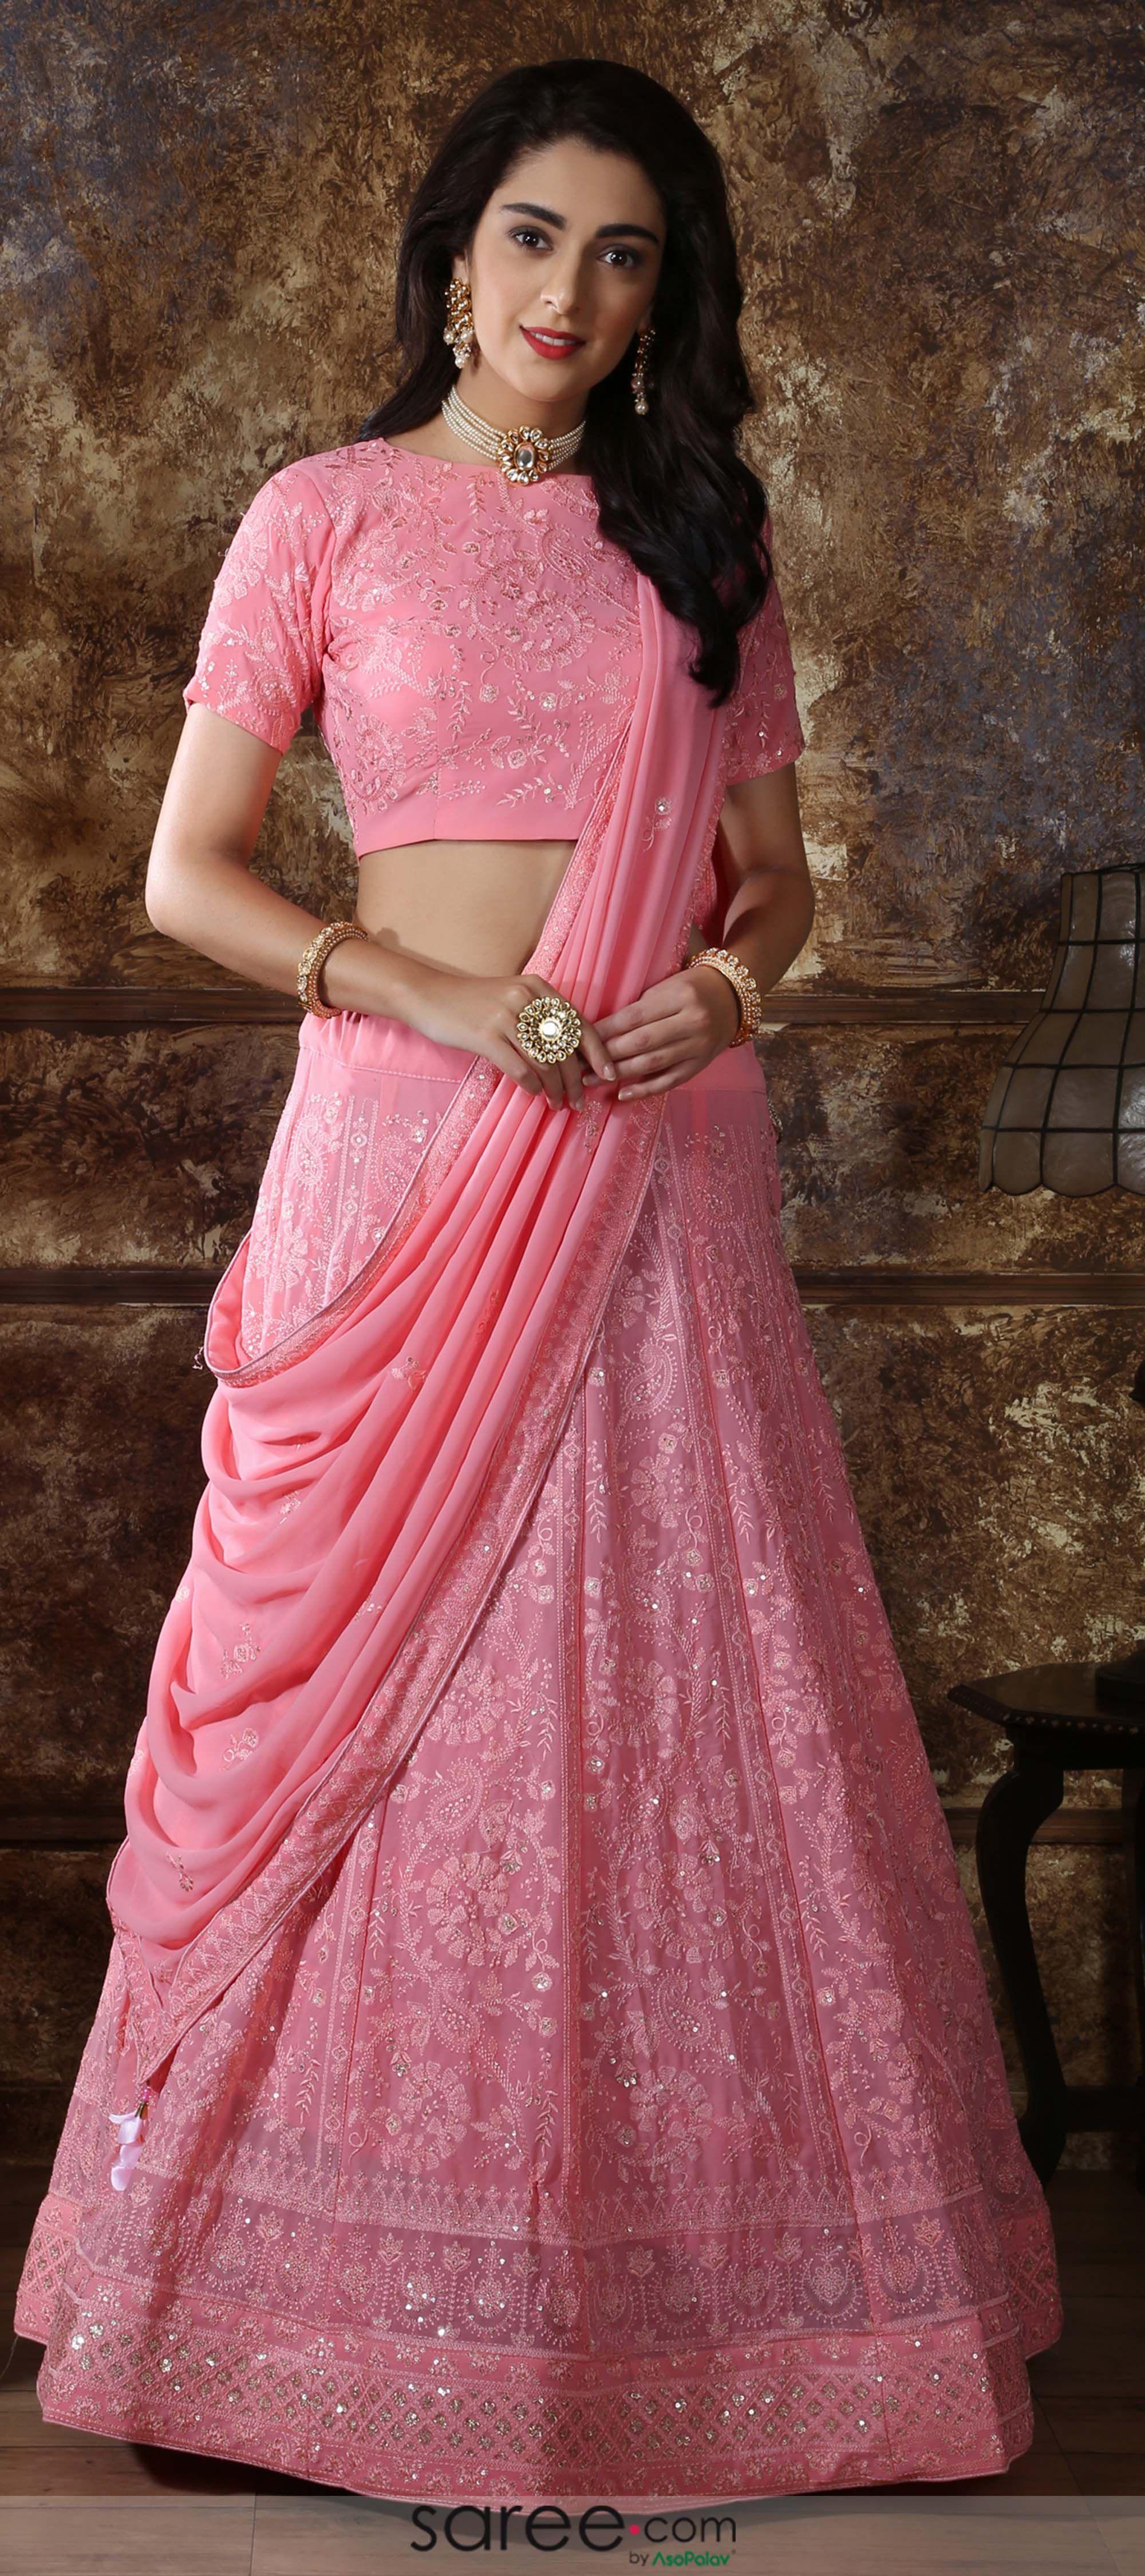 Pin By Sampatti Bairagi On Dresses Simple Lehenga Choli Simple Lehenga Lehenga Designs Latest